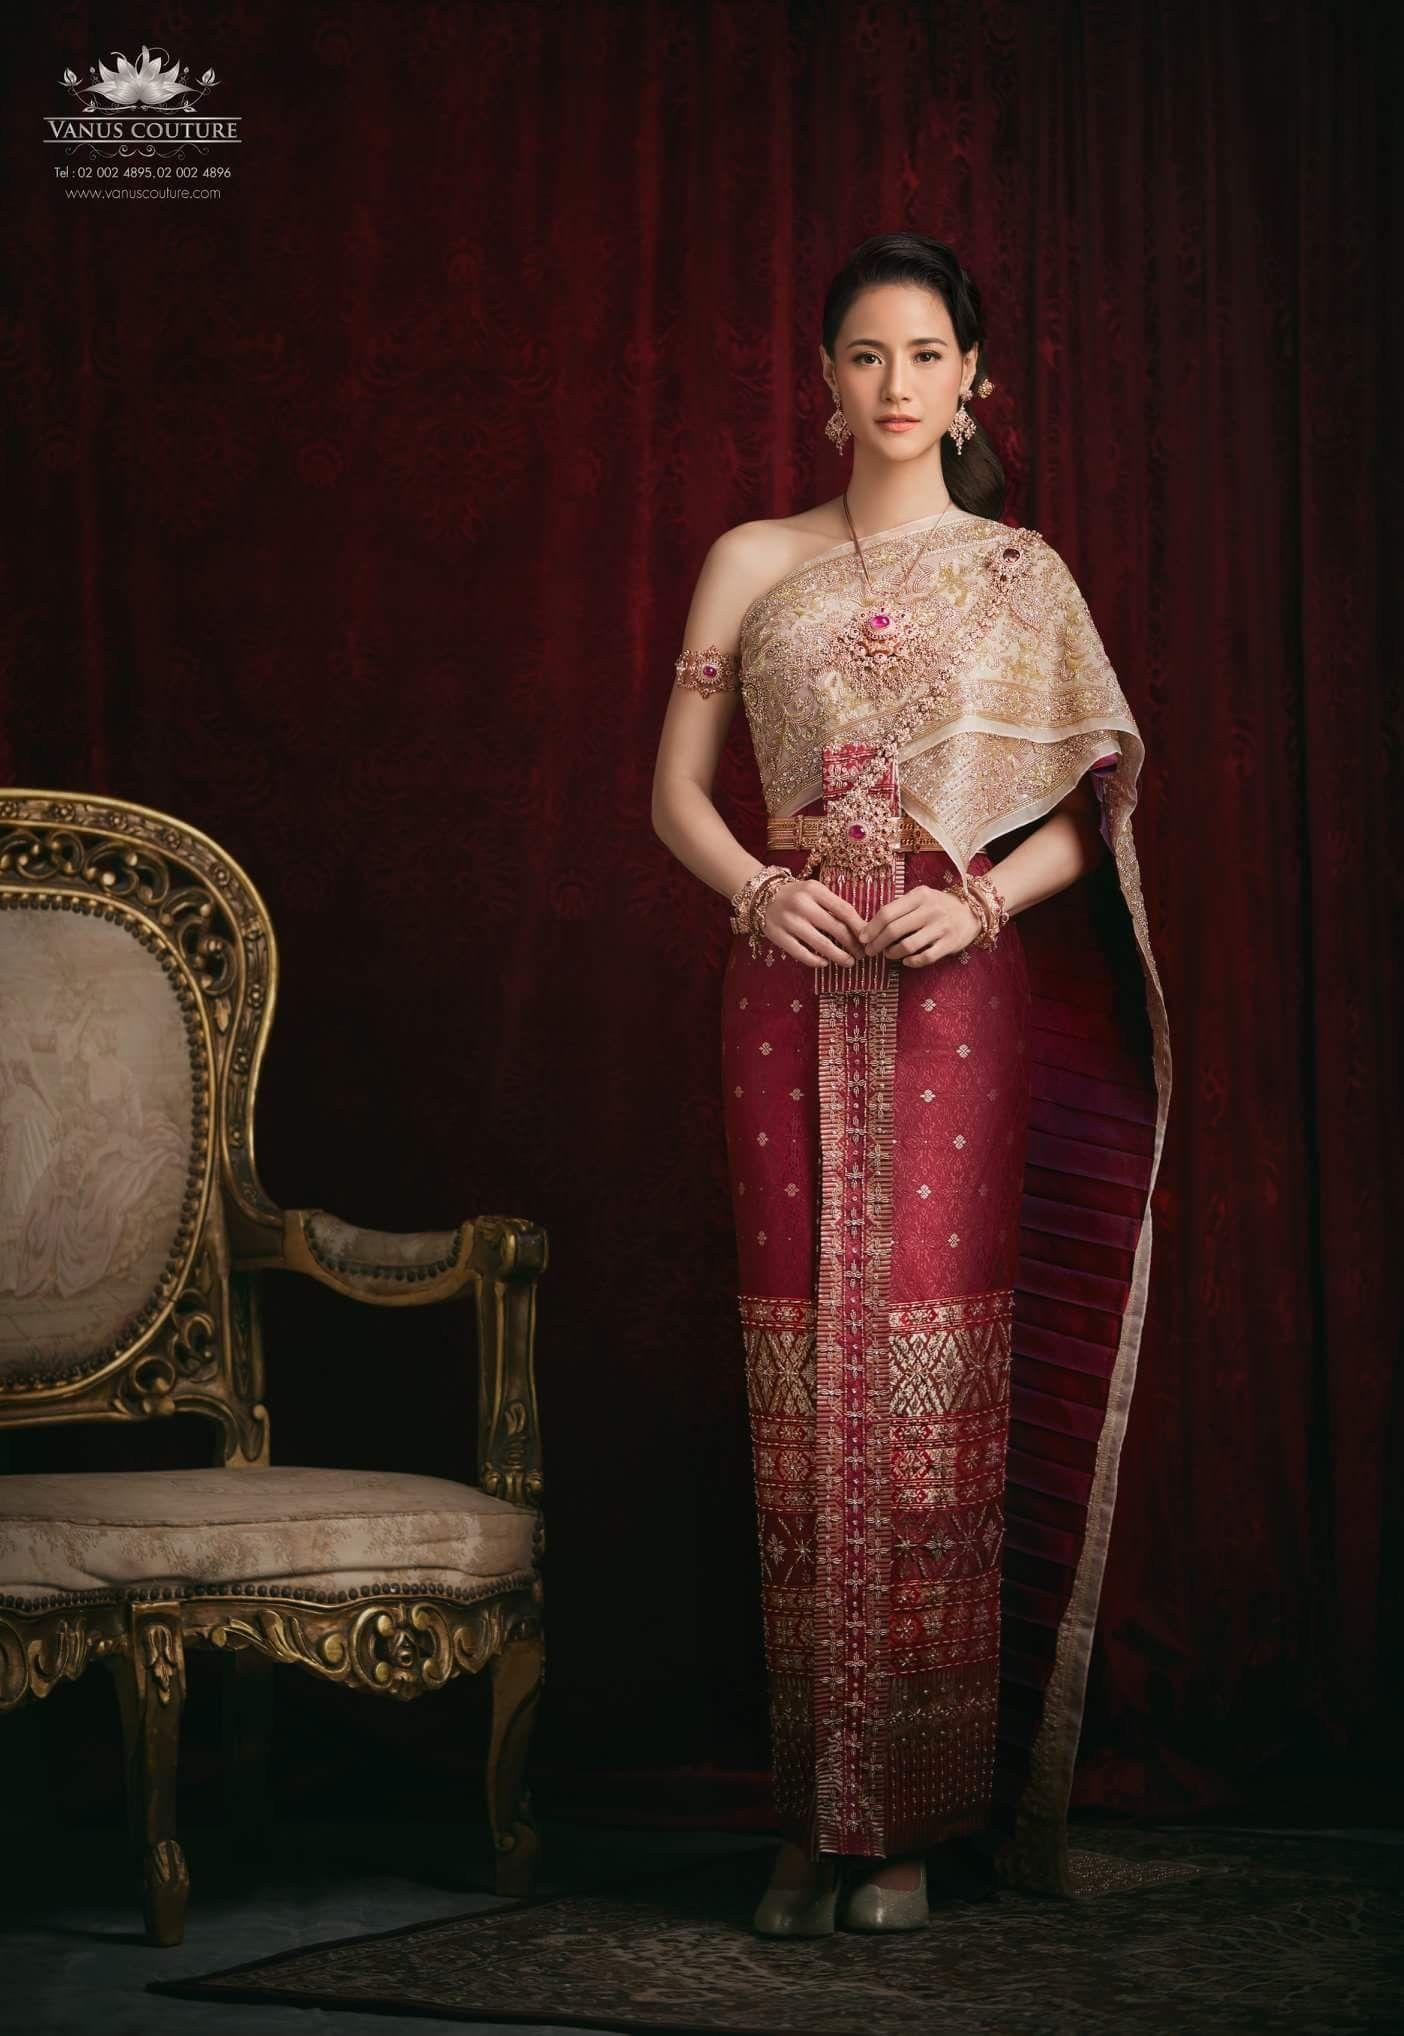 Pin by sini bal on thai wedding in pinterest thai dress